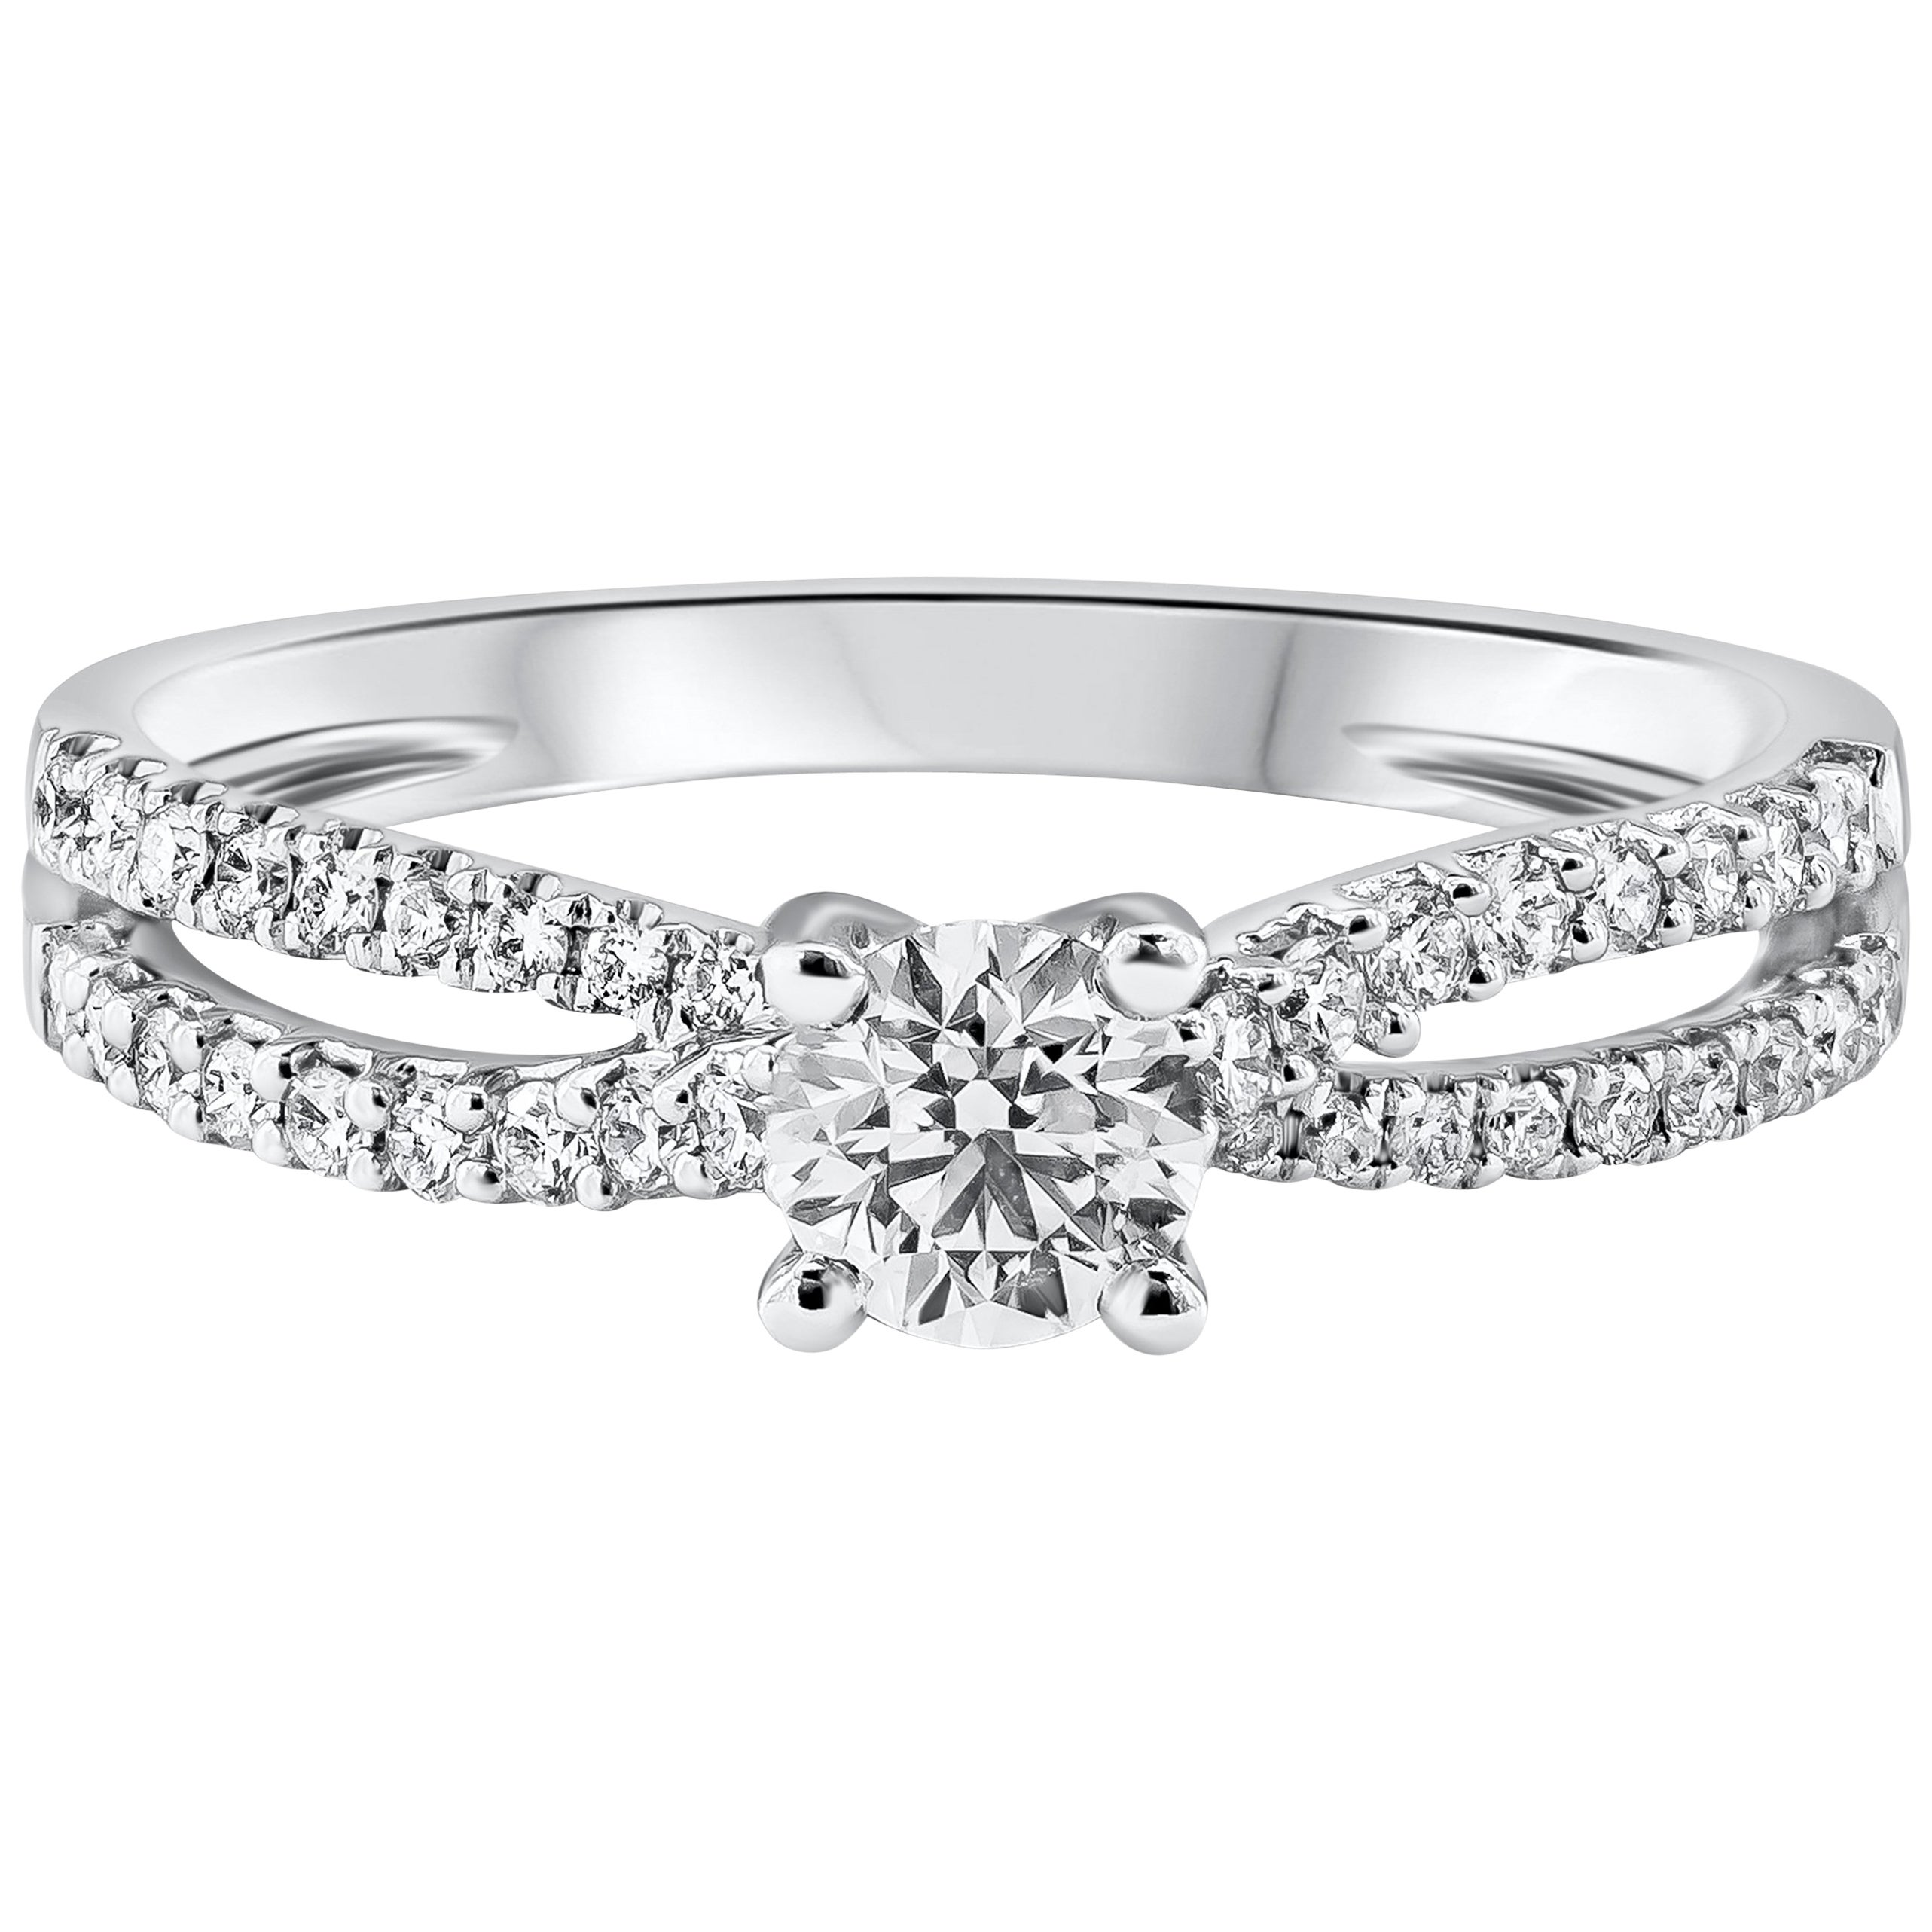 Roman Malakov 0.39 Carat Round Diamond Entwined Shank Engagement Ring